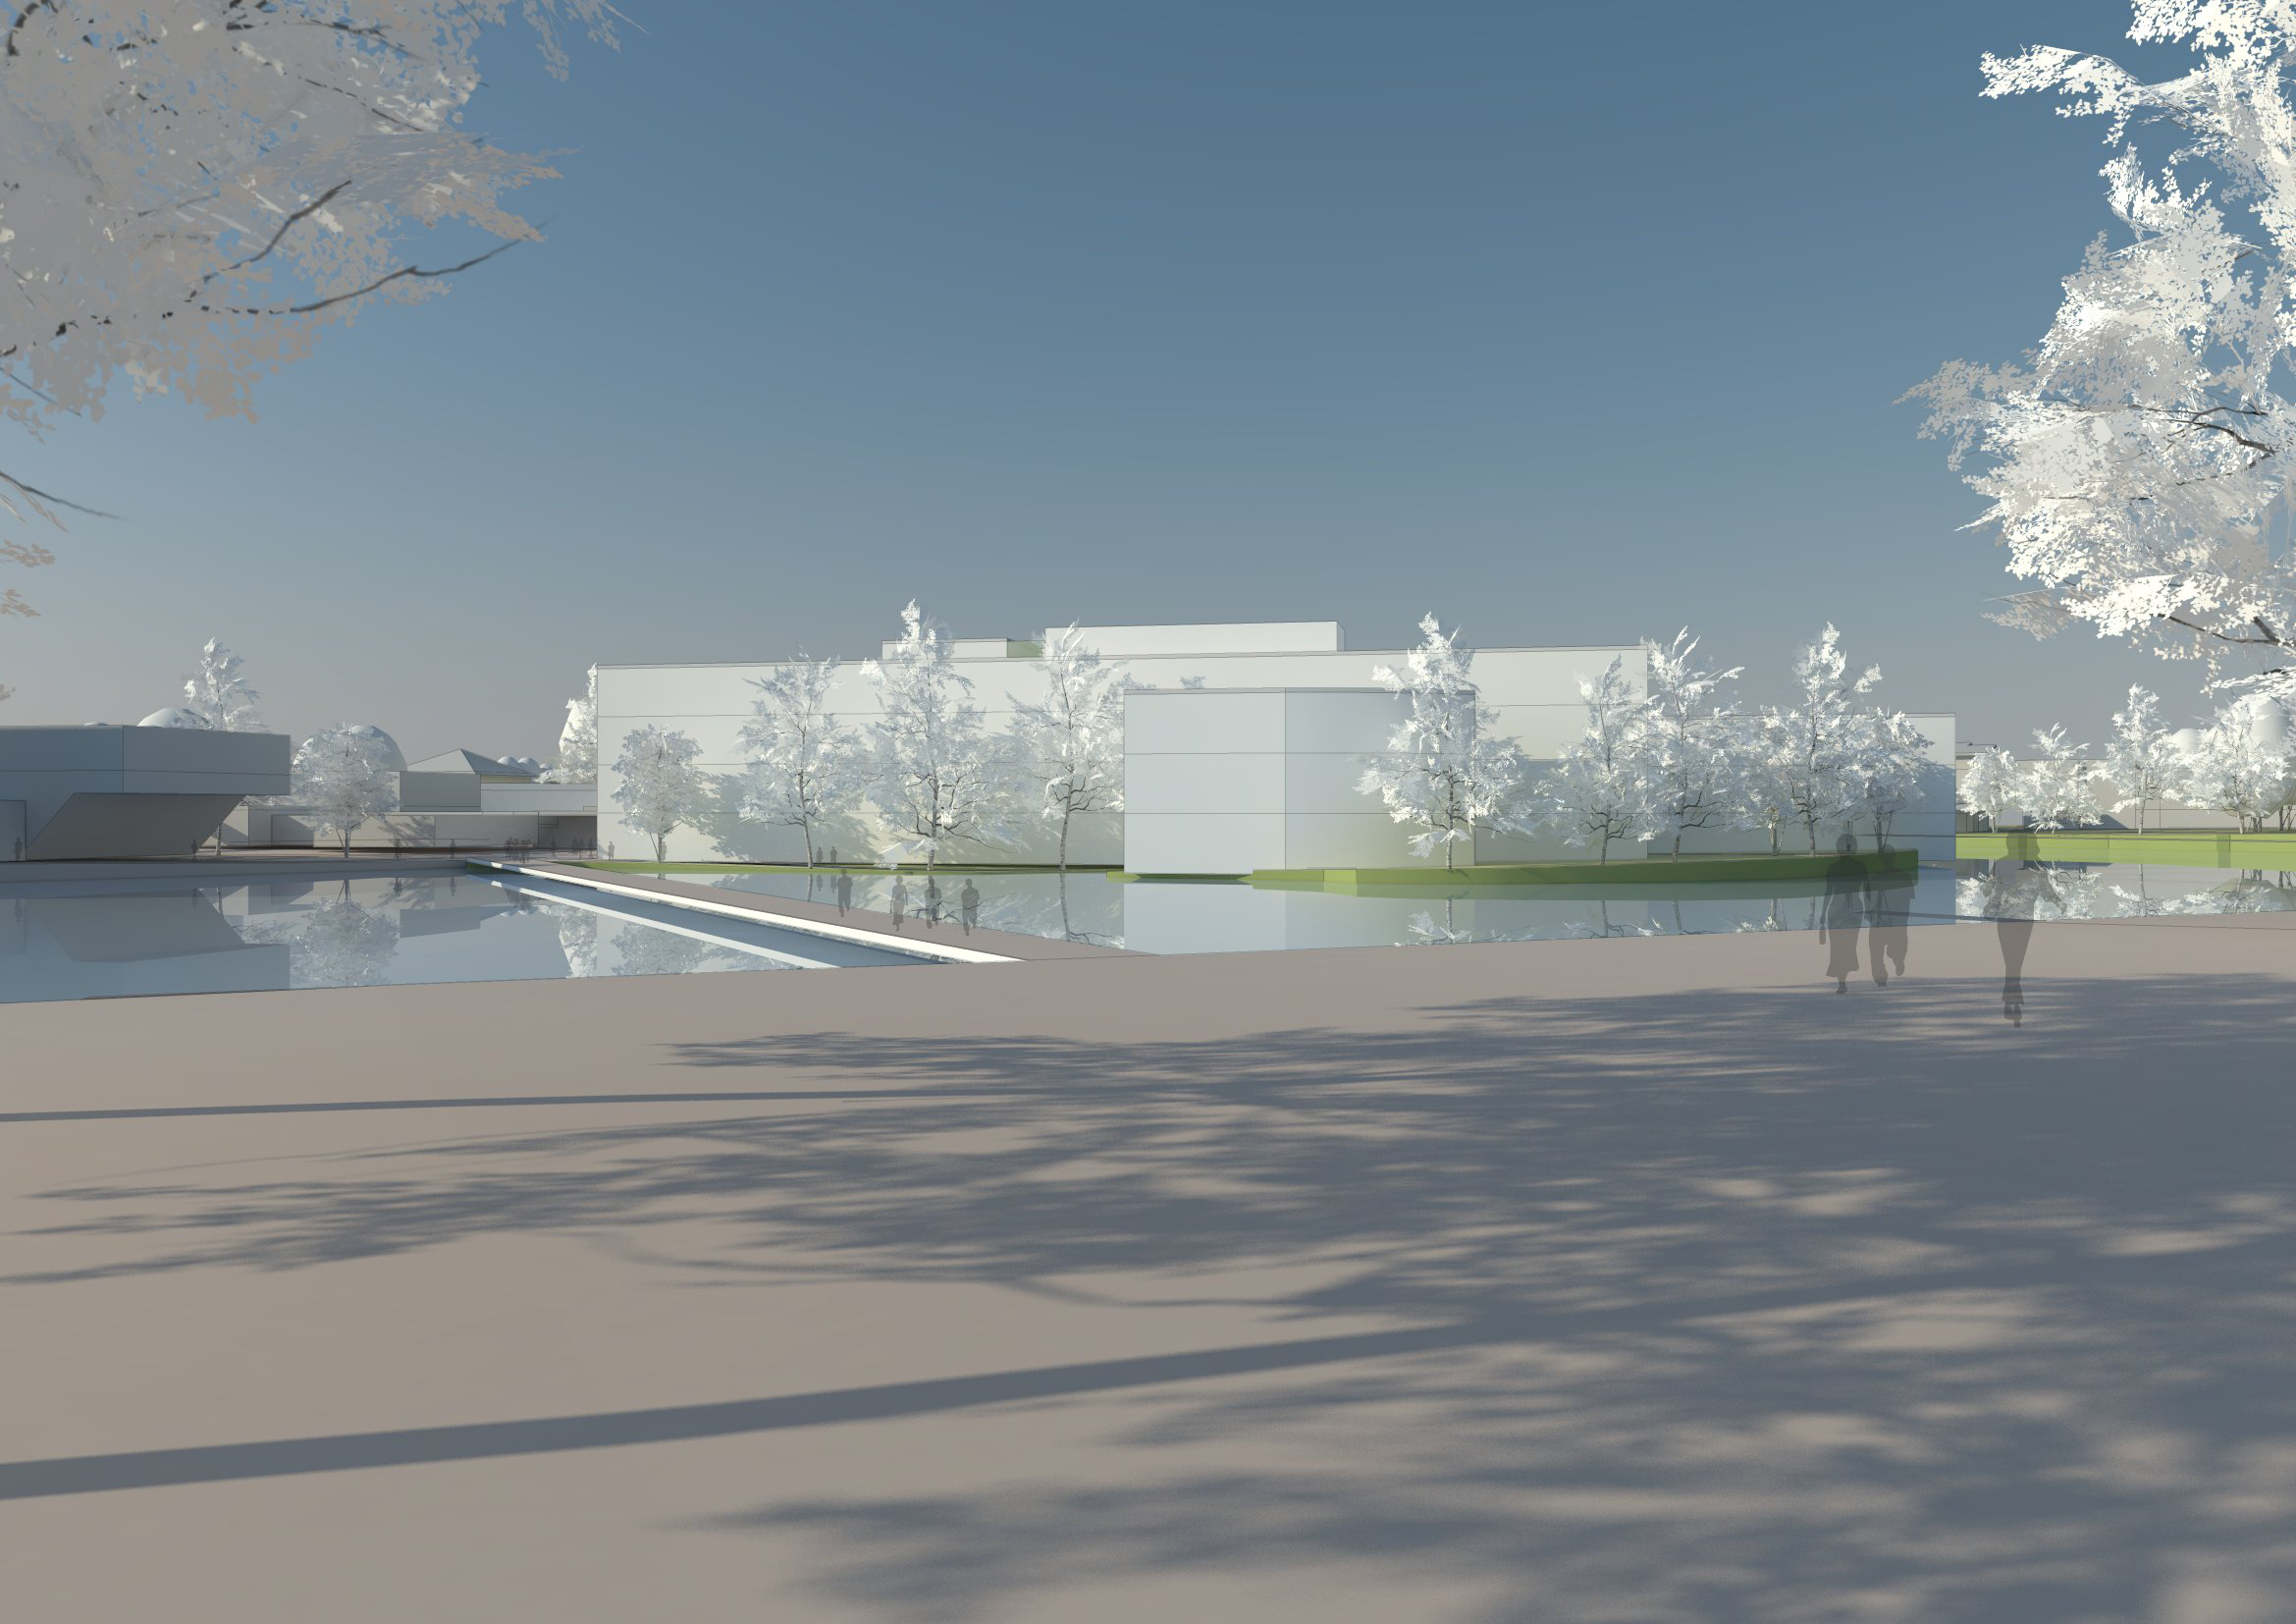 Stephen-Hill-Architects-York-University-Peninsula-Study-05